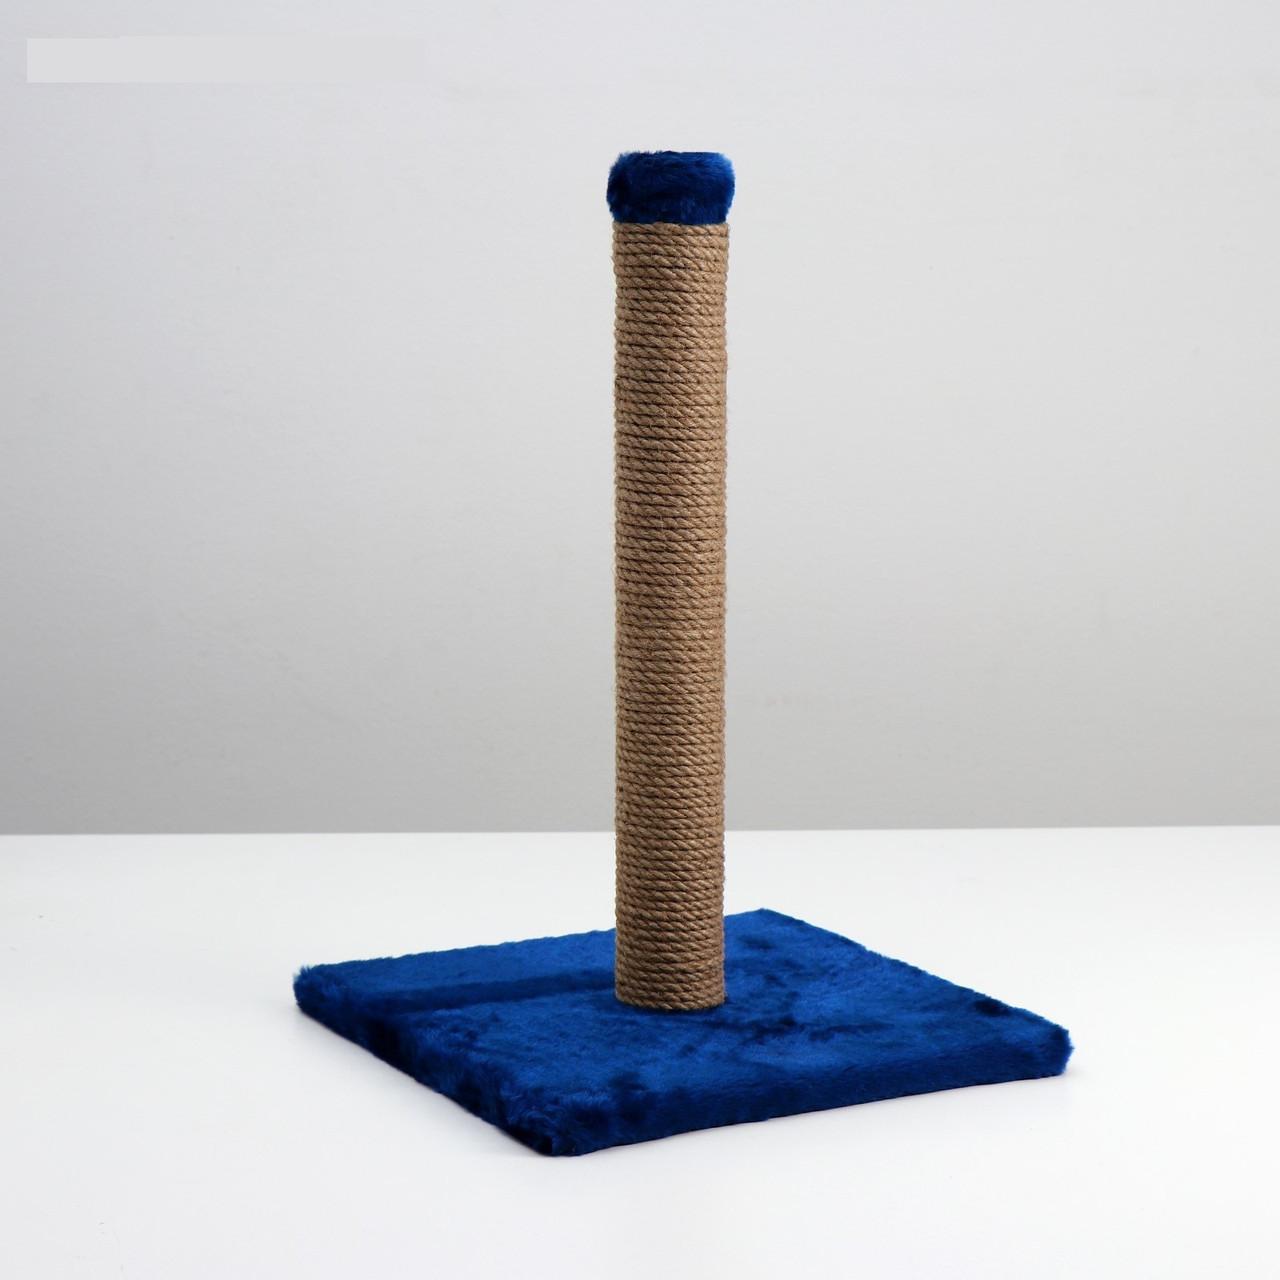 "Когтеточка ""Столбик"" на подставке, 35 х 35 х 55 см микс цветов"